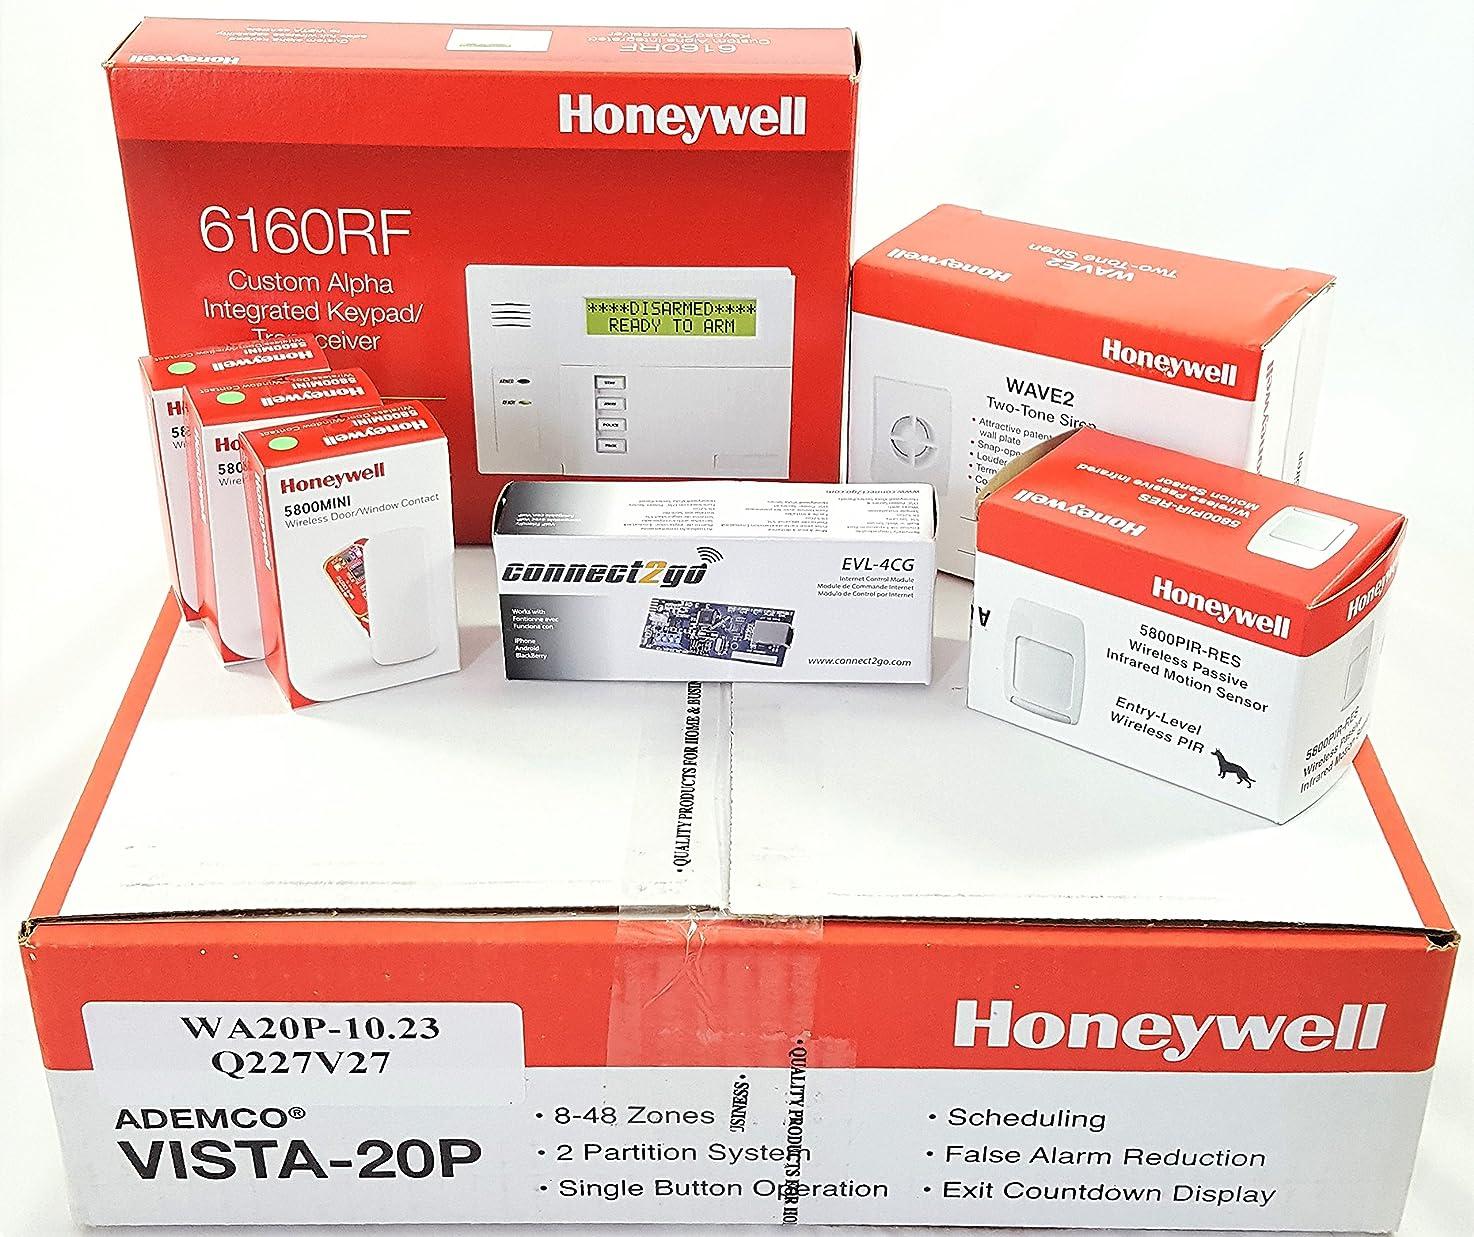 Honeywell Vista 20P Wireless Self Monitoring Kit with a 6160RF Keypad, One 5800PIR-Res Motion Sensor, One EVL-4CG EnvisaLink, Three 5800MINI Door/Window Contacts, and a WAVE2 Siren bpnohrdtnbsdj0